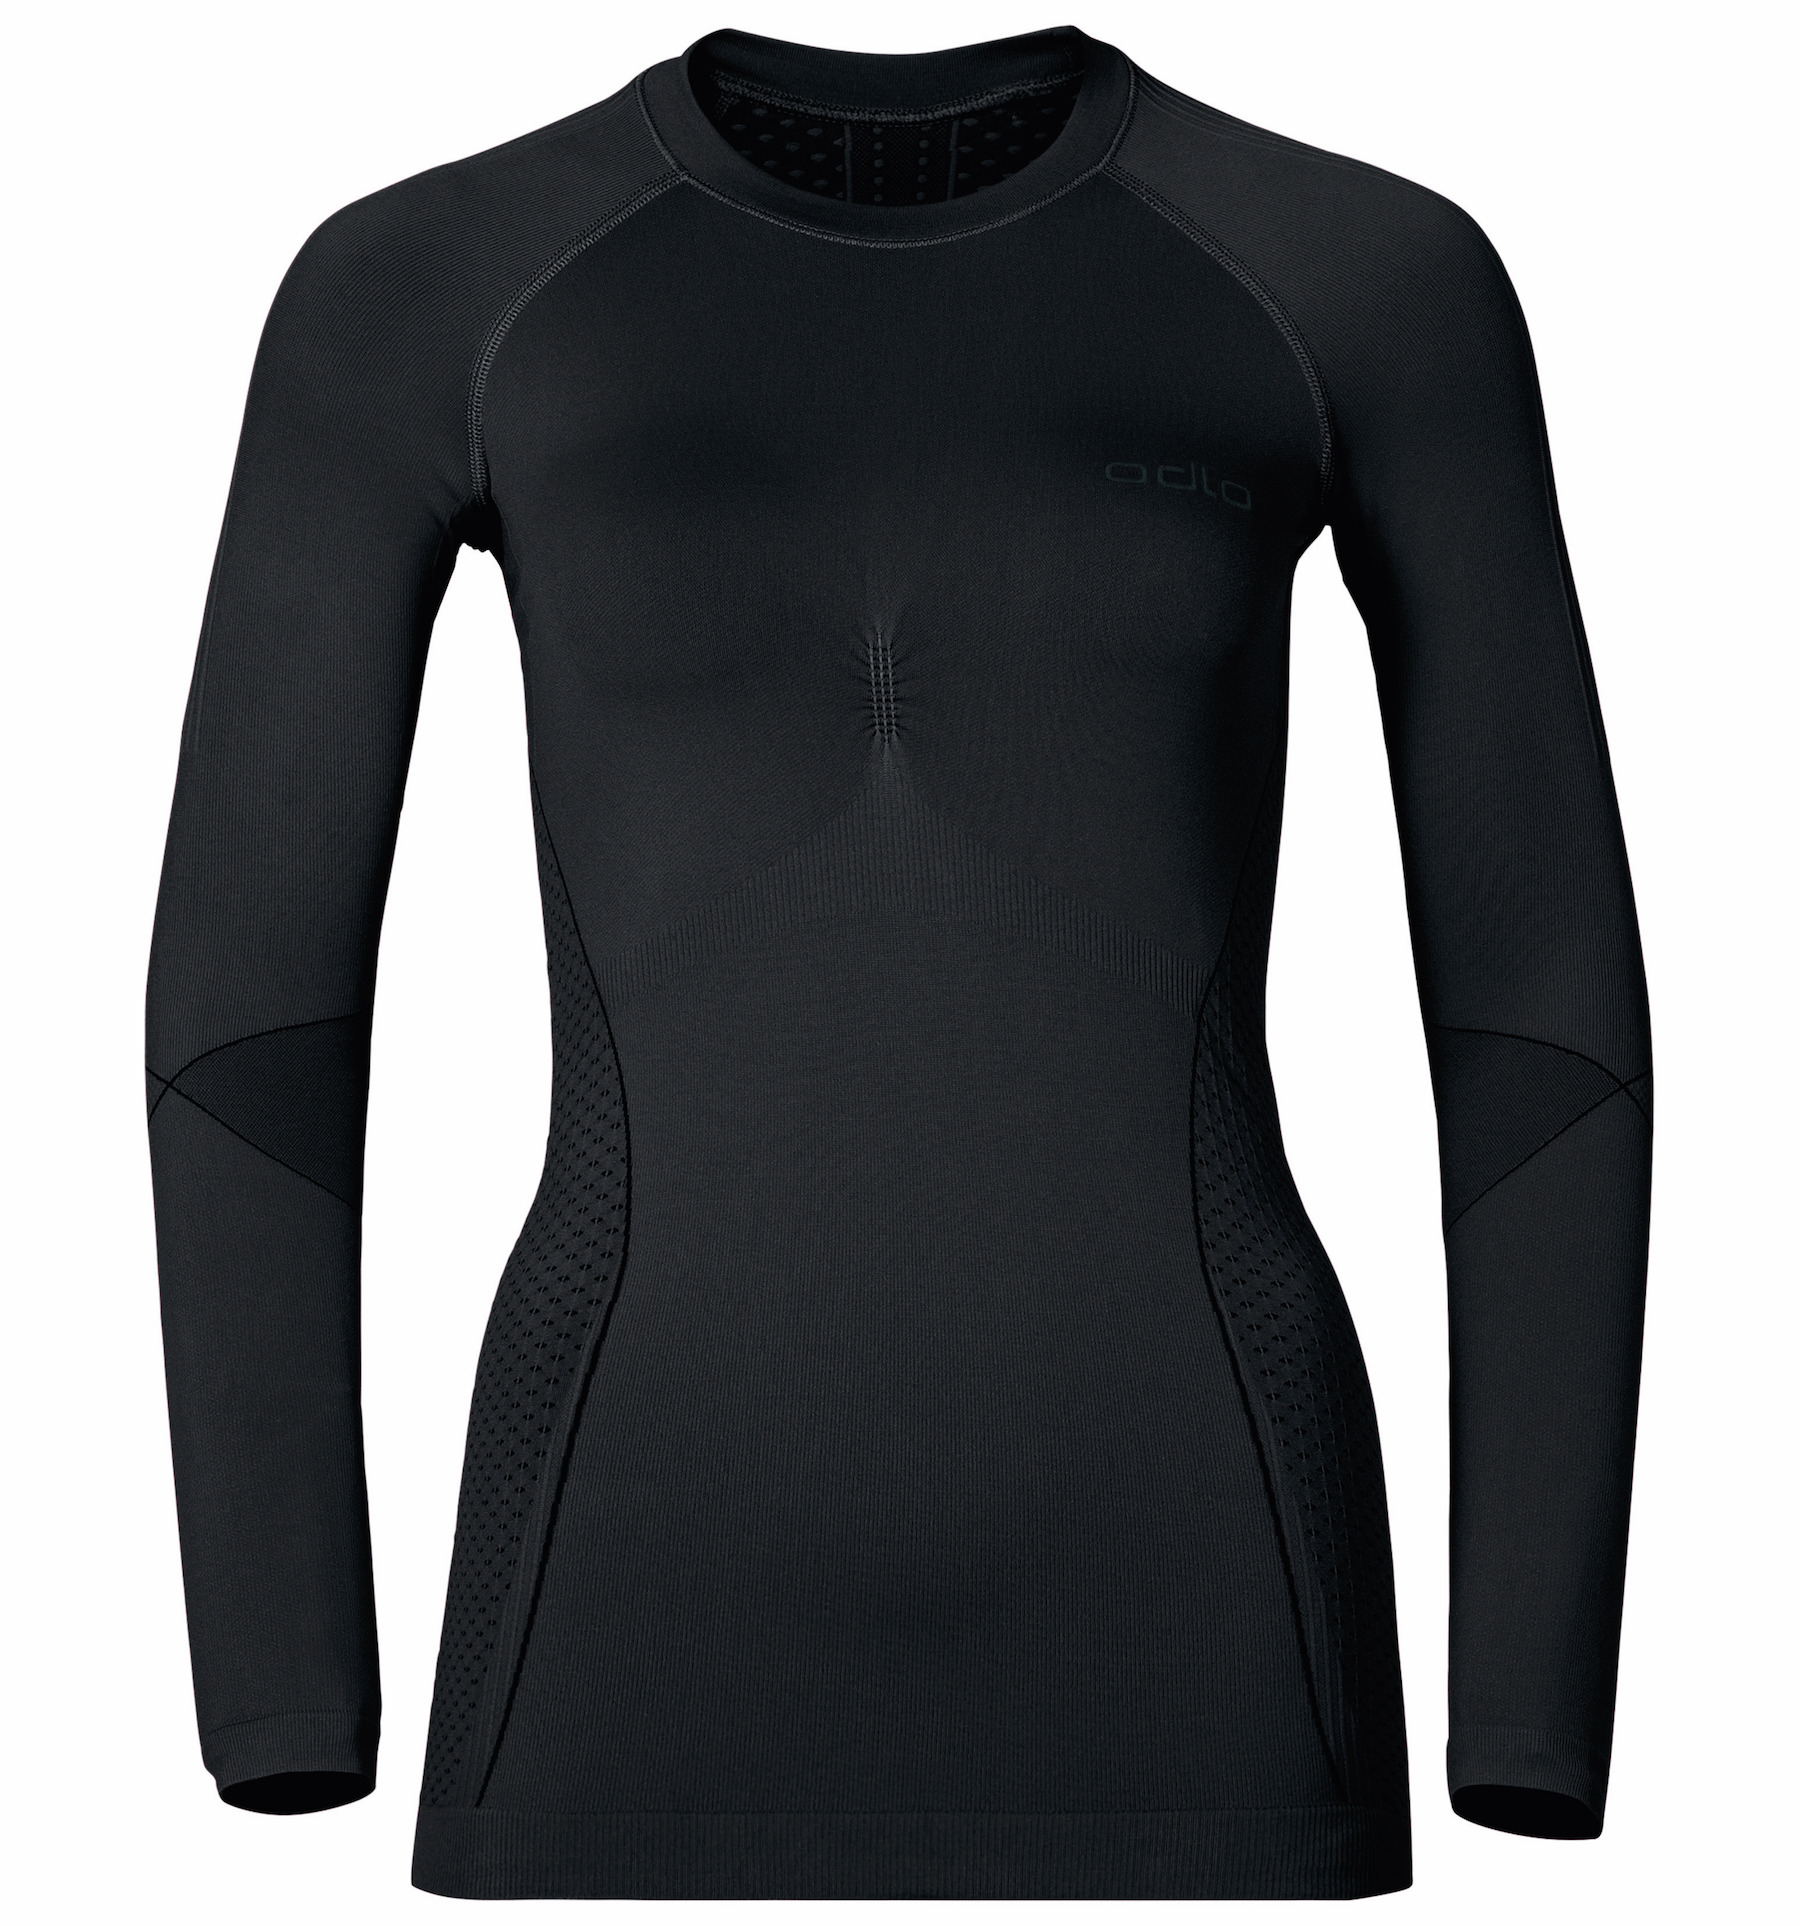 Odlo Evolution Warm - Laufshirt - Damen